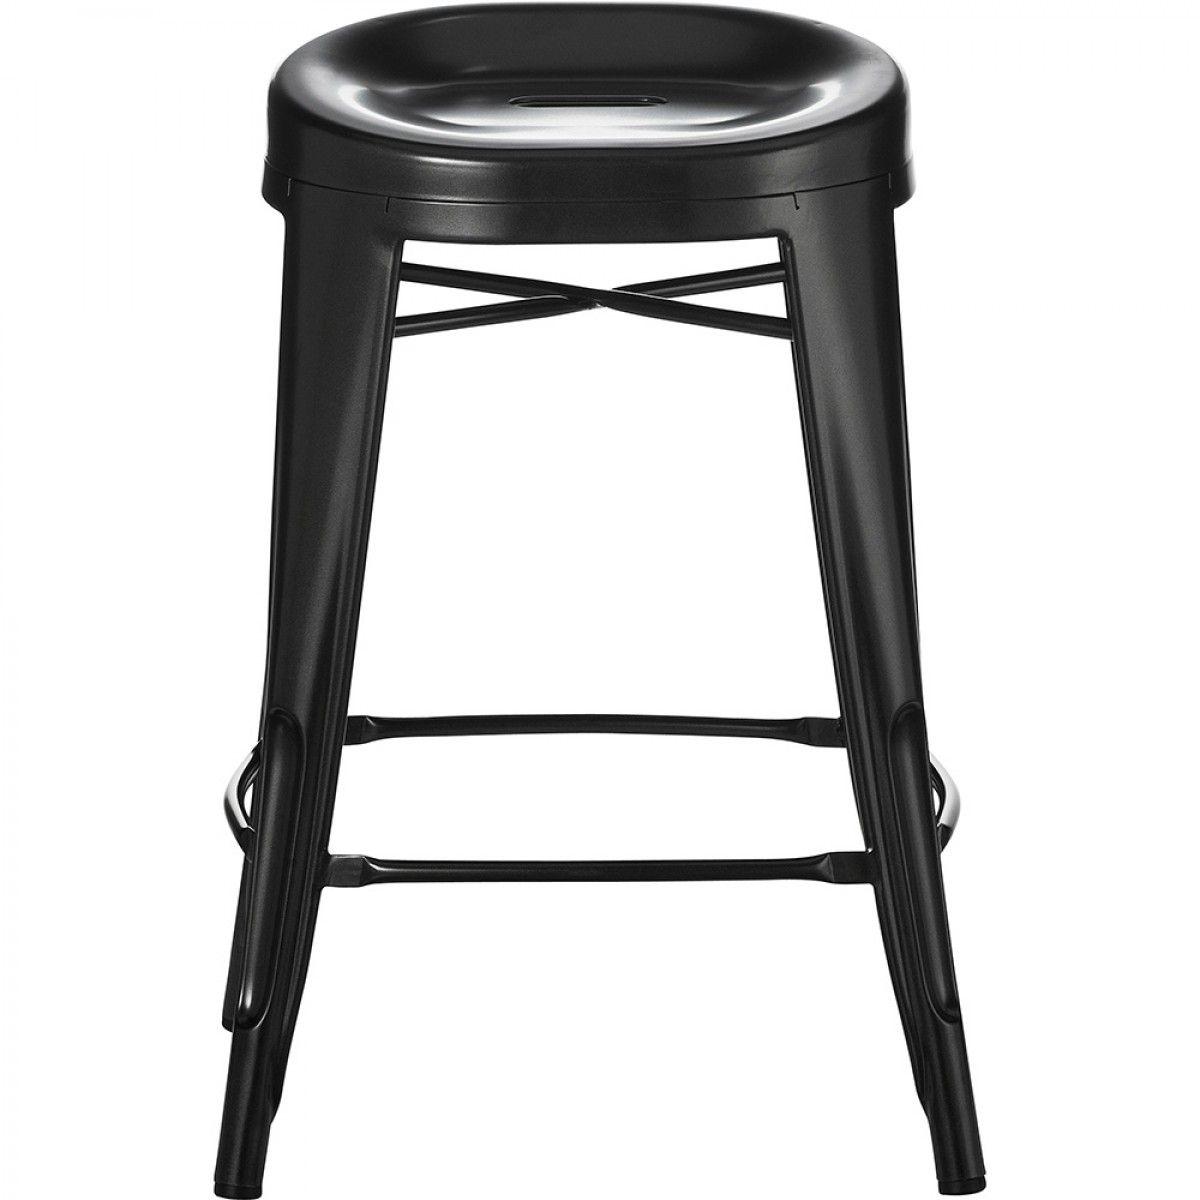 Sensational 79 Early Settler Fenton Barstool Charcoal Stools Dining Gamerscity Chair Design For Home Gamerscityorg